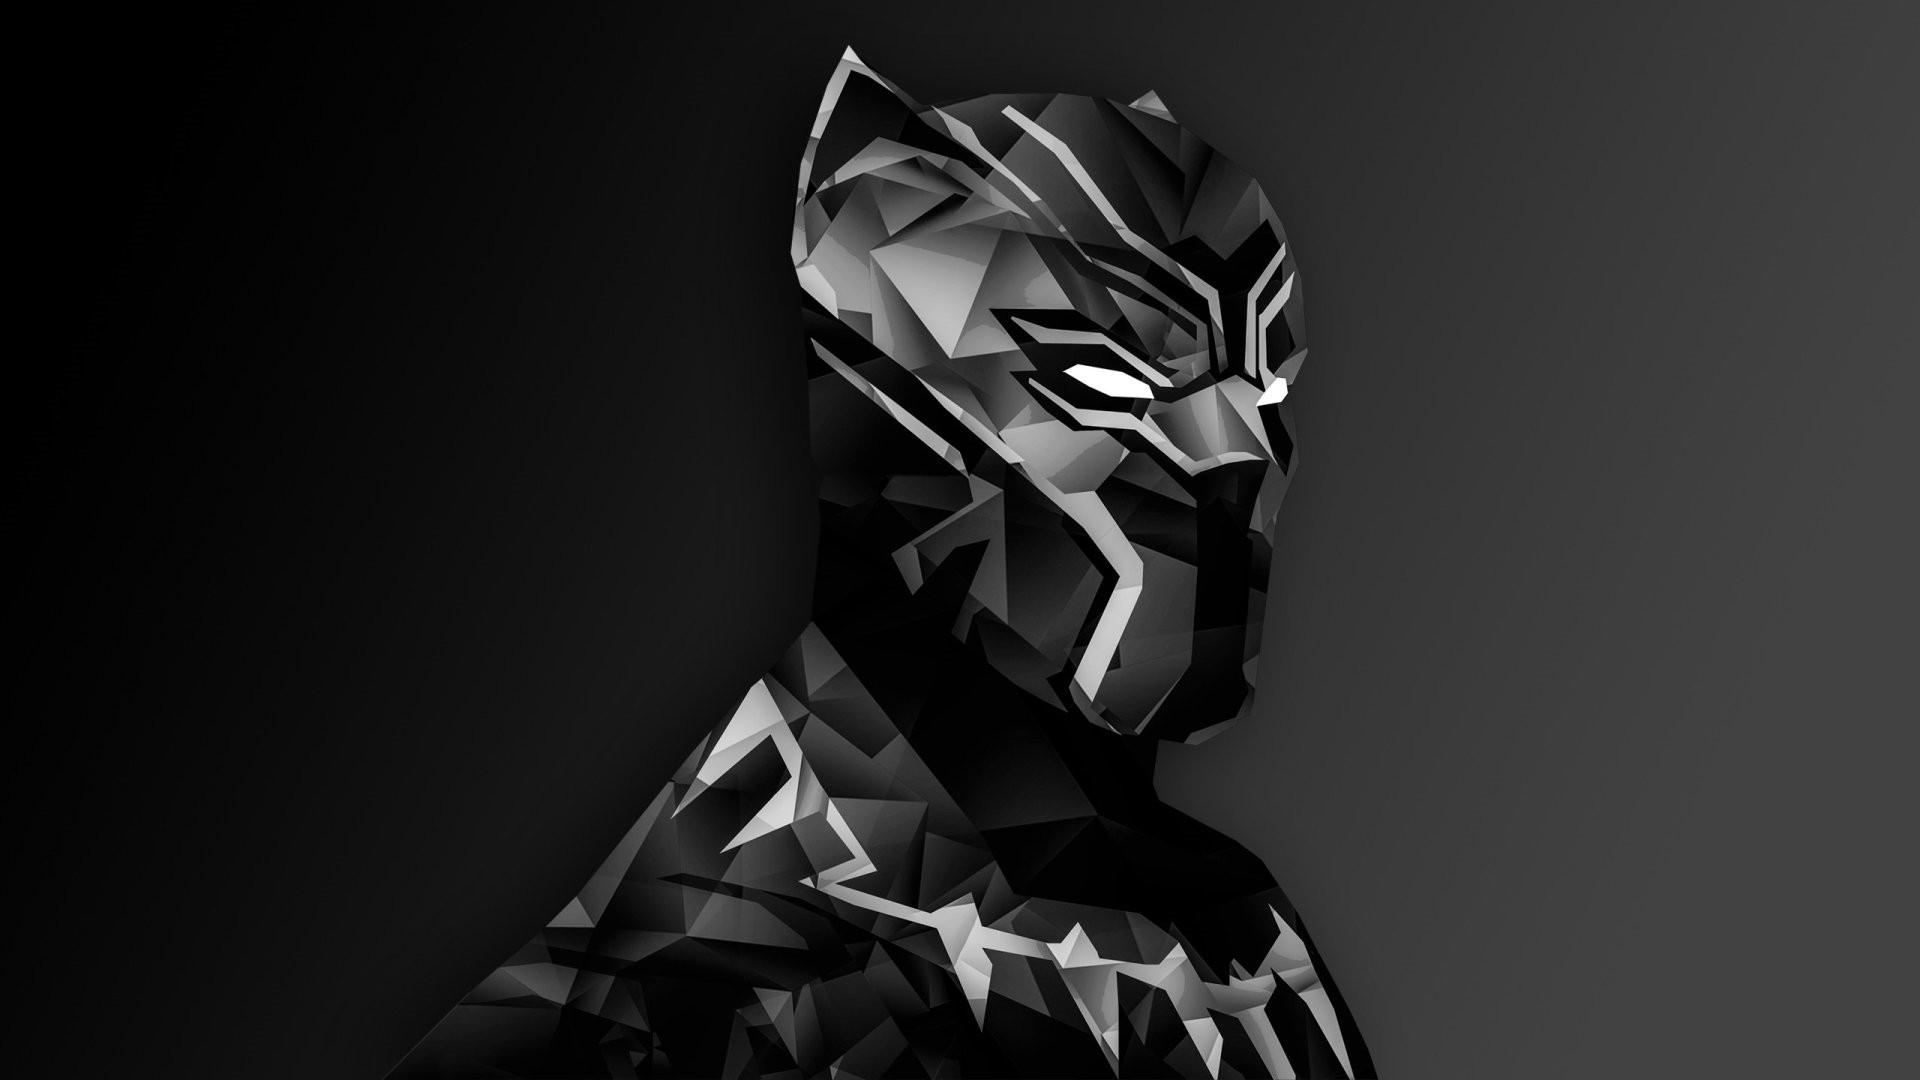 Black Panther hd desktop wallpaper